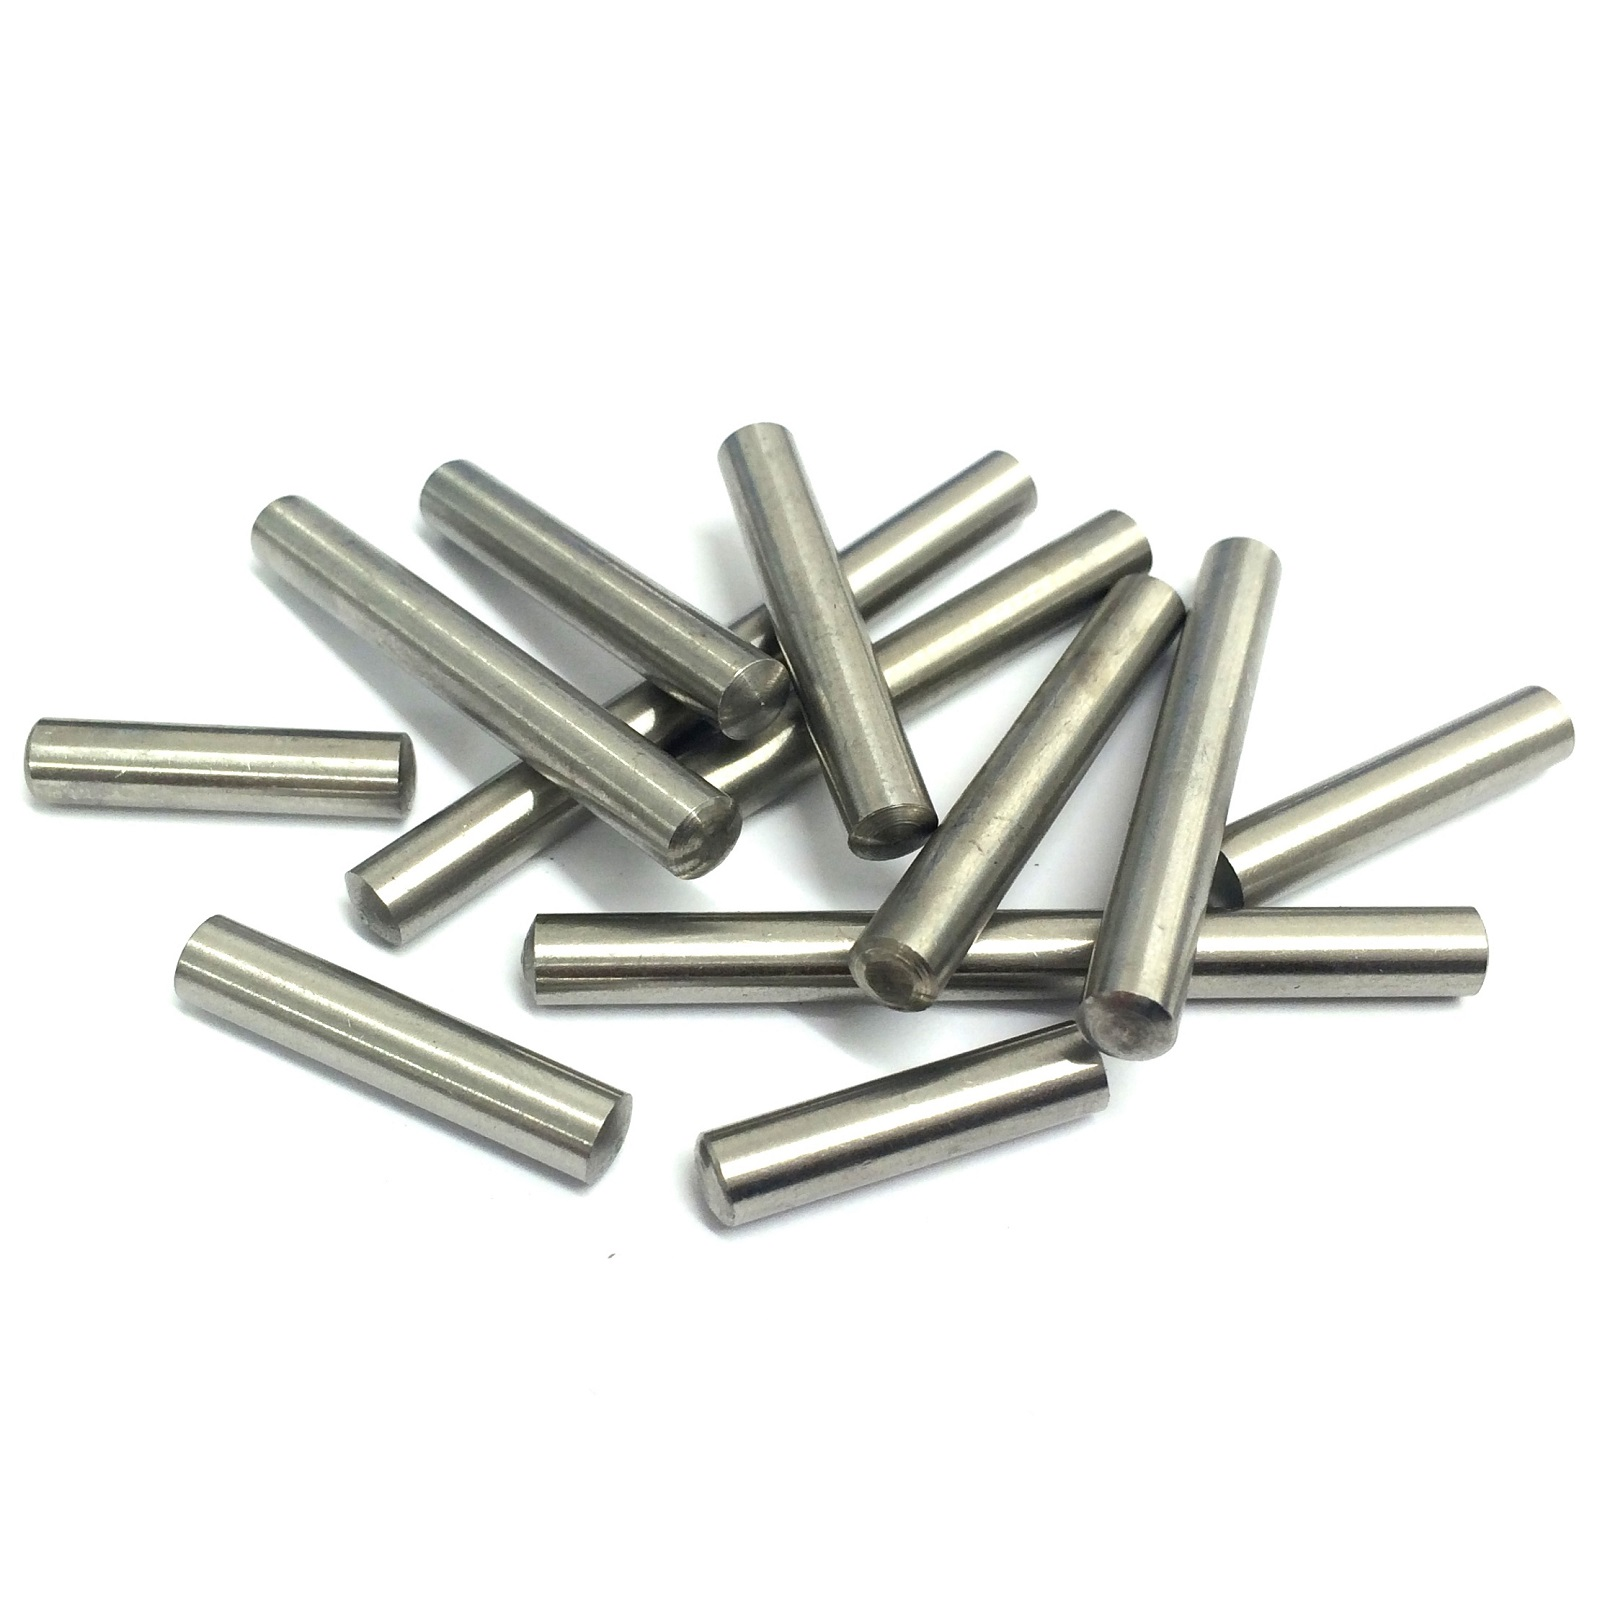 4mm 5mm 6mm 8mm 10mm 12mm 14mm 16mm 18mm 20mm 22mm 24mm BZP HEX NUT ZINC PLATED